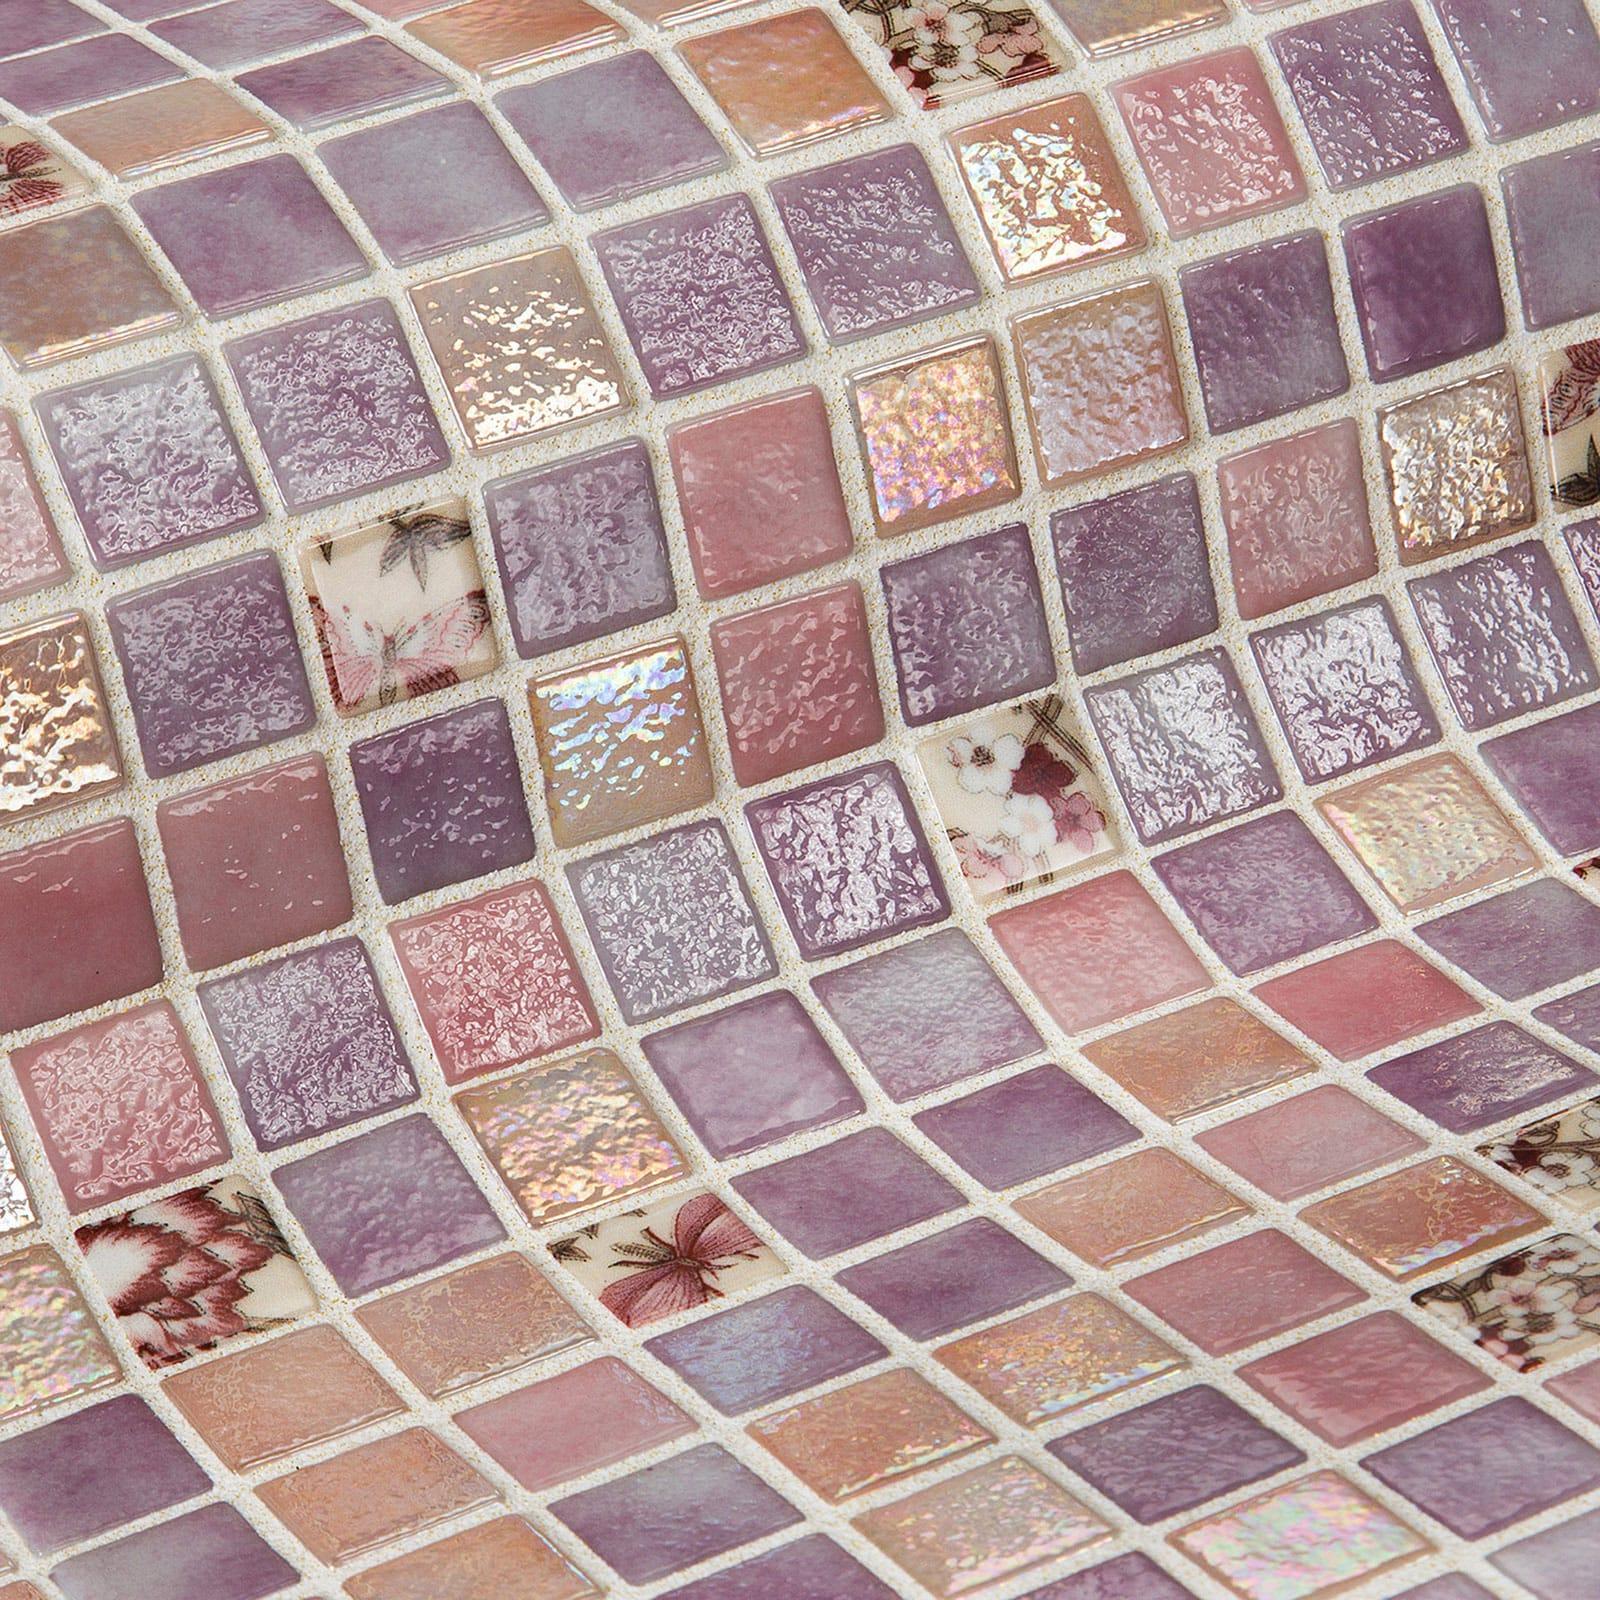 11-Violet-Topping-Mosaic-Ezarri.jpg